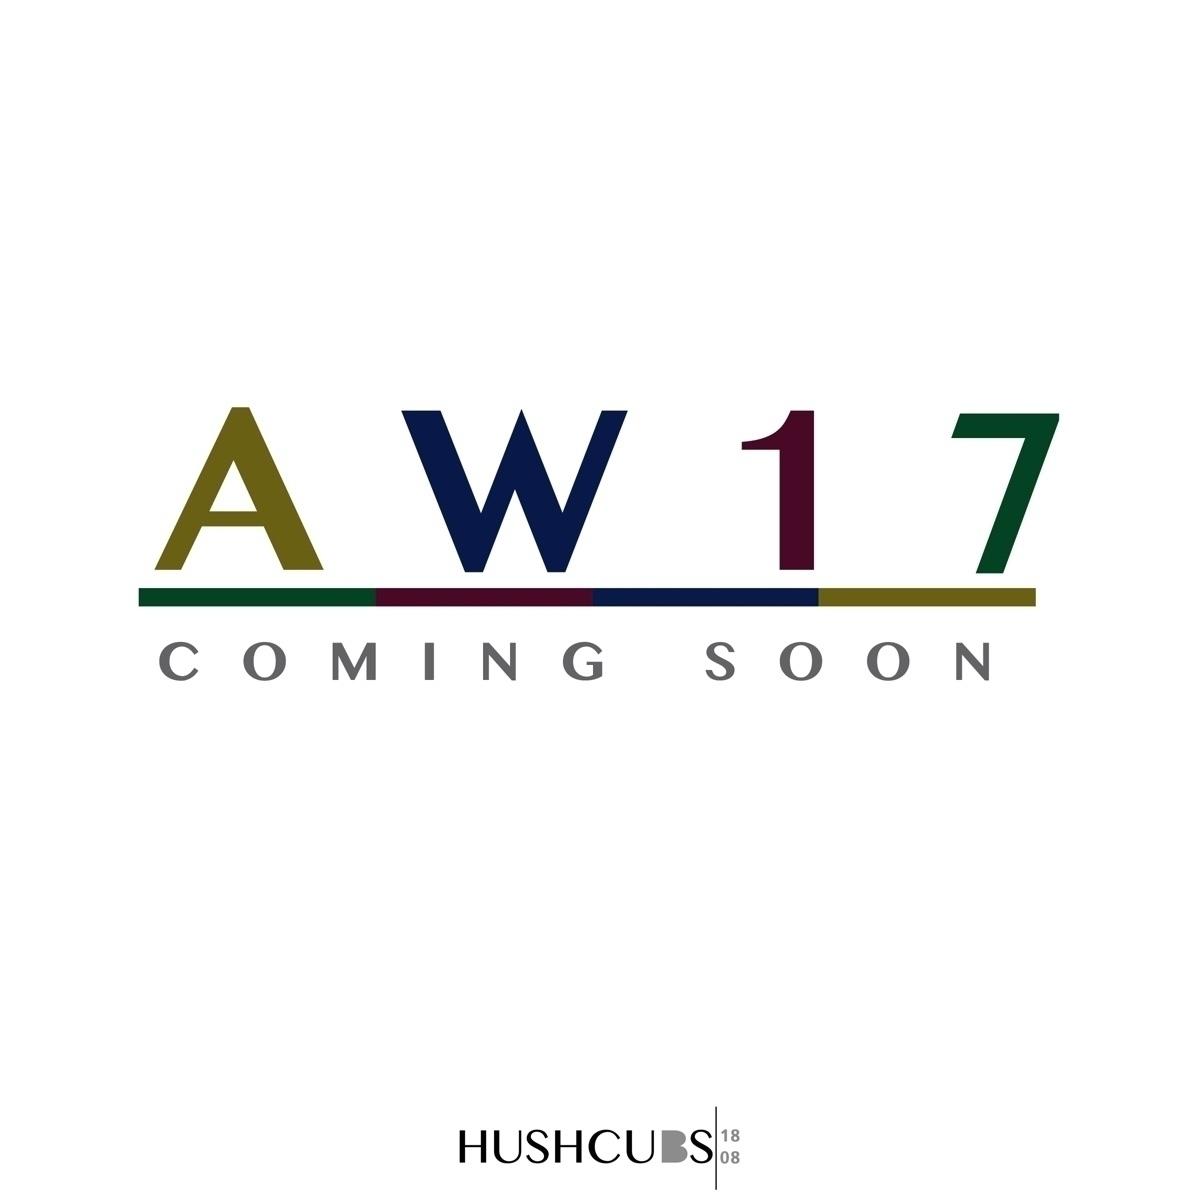 HushCubs1808 (@hushcubs1808) Cover Image